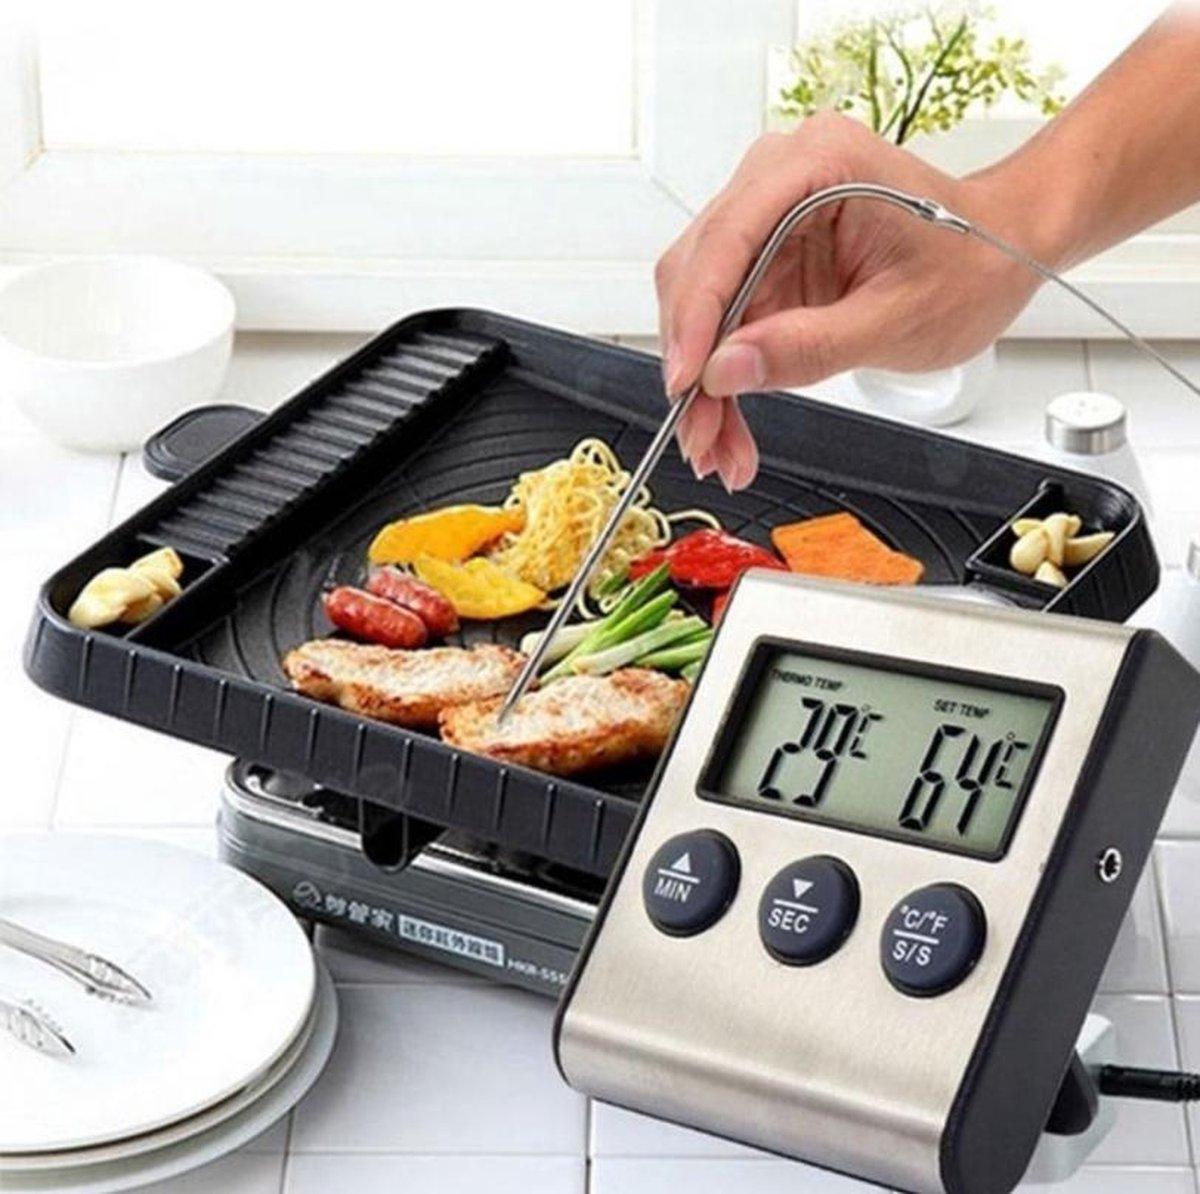 Keukenthermometer met Batterijen - Digitale Keuken Thermometer - Kernthermometer BBQ - Oventhermometer - Vleesthermometer - Draadloos